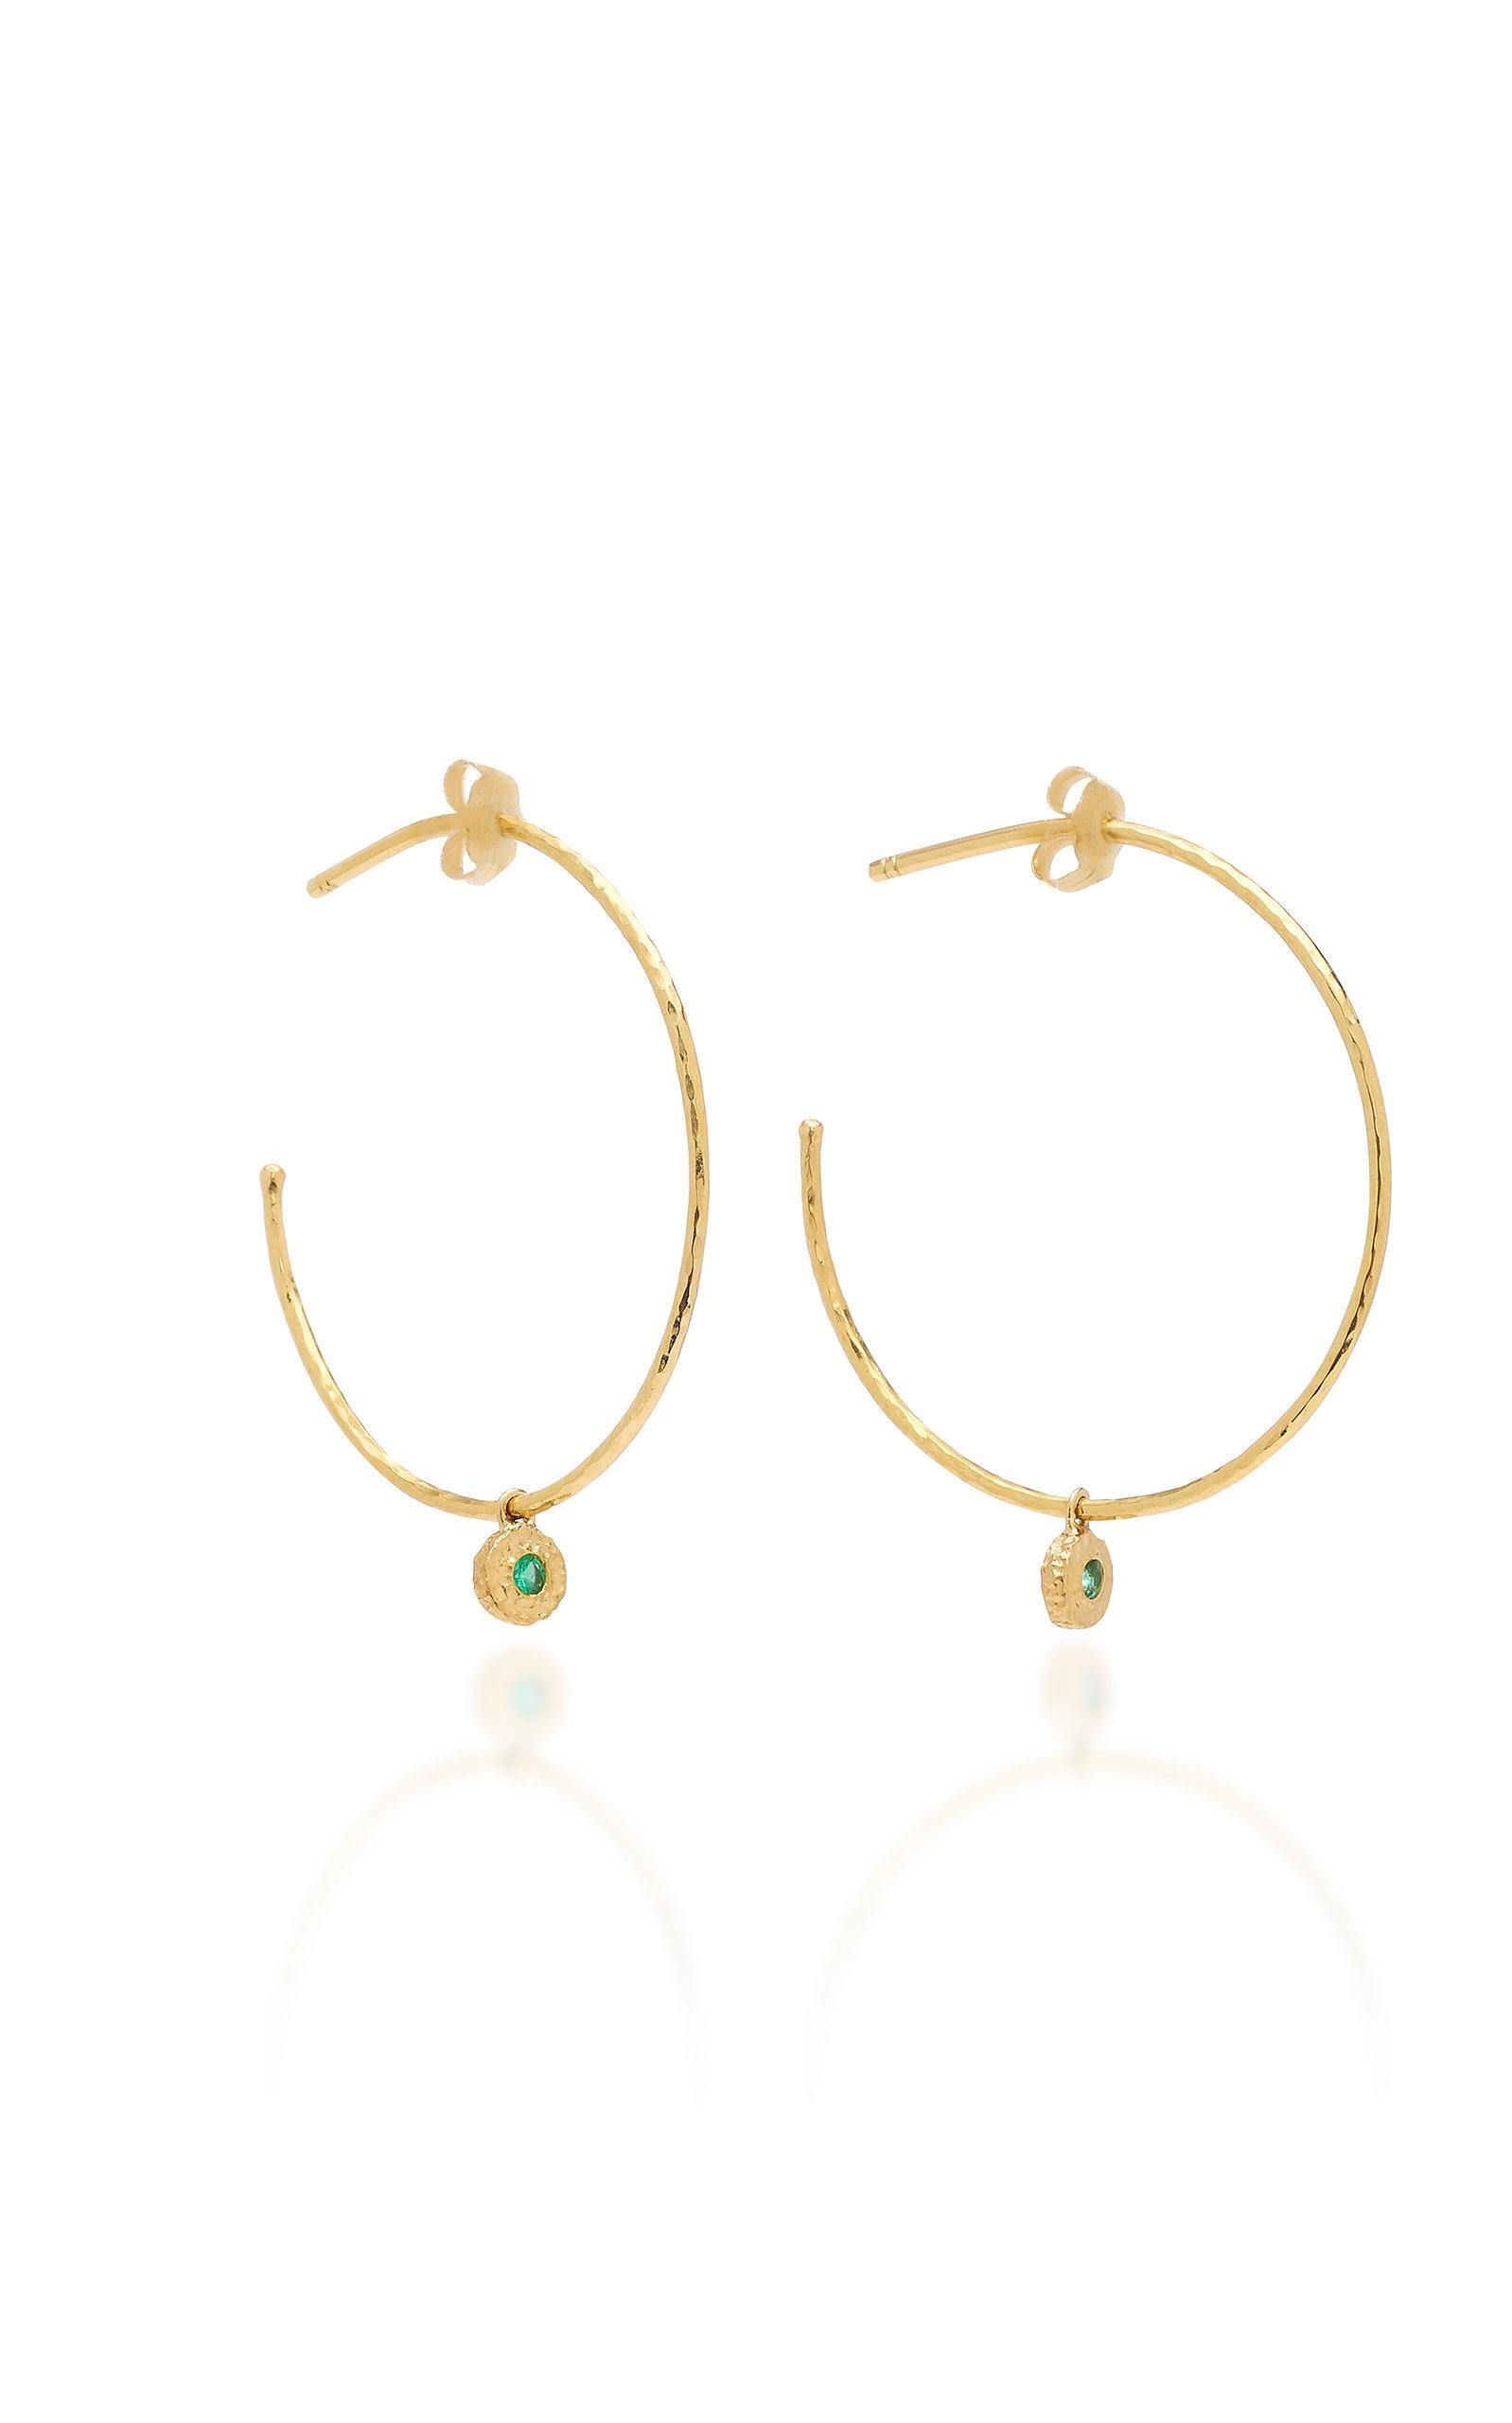 c79d9e78a Octavia Elizabeth Nesting Gem Emerald And 18K Gold Hoop Earrings In Green